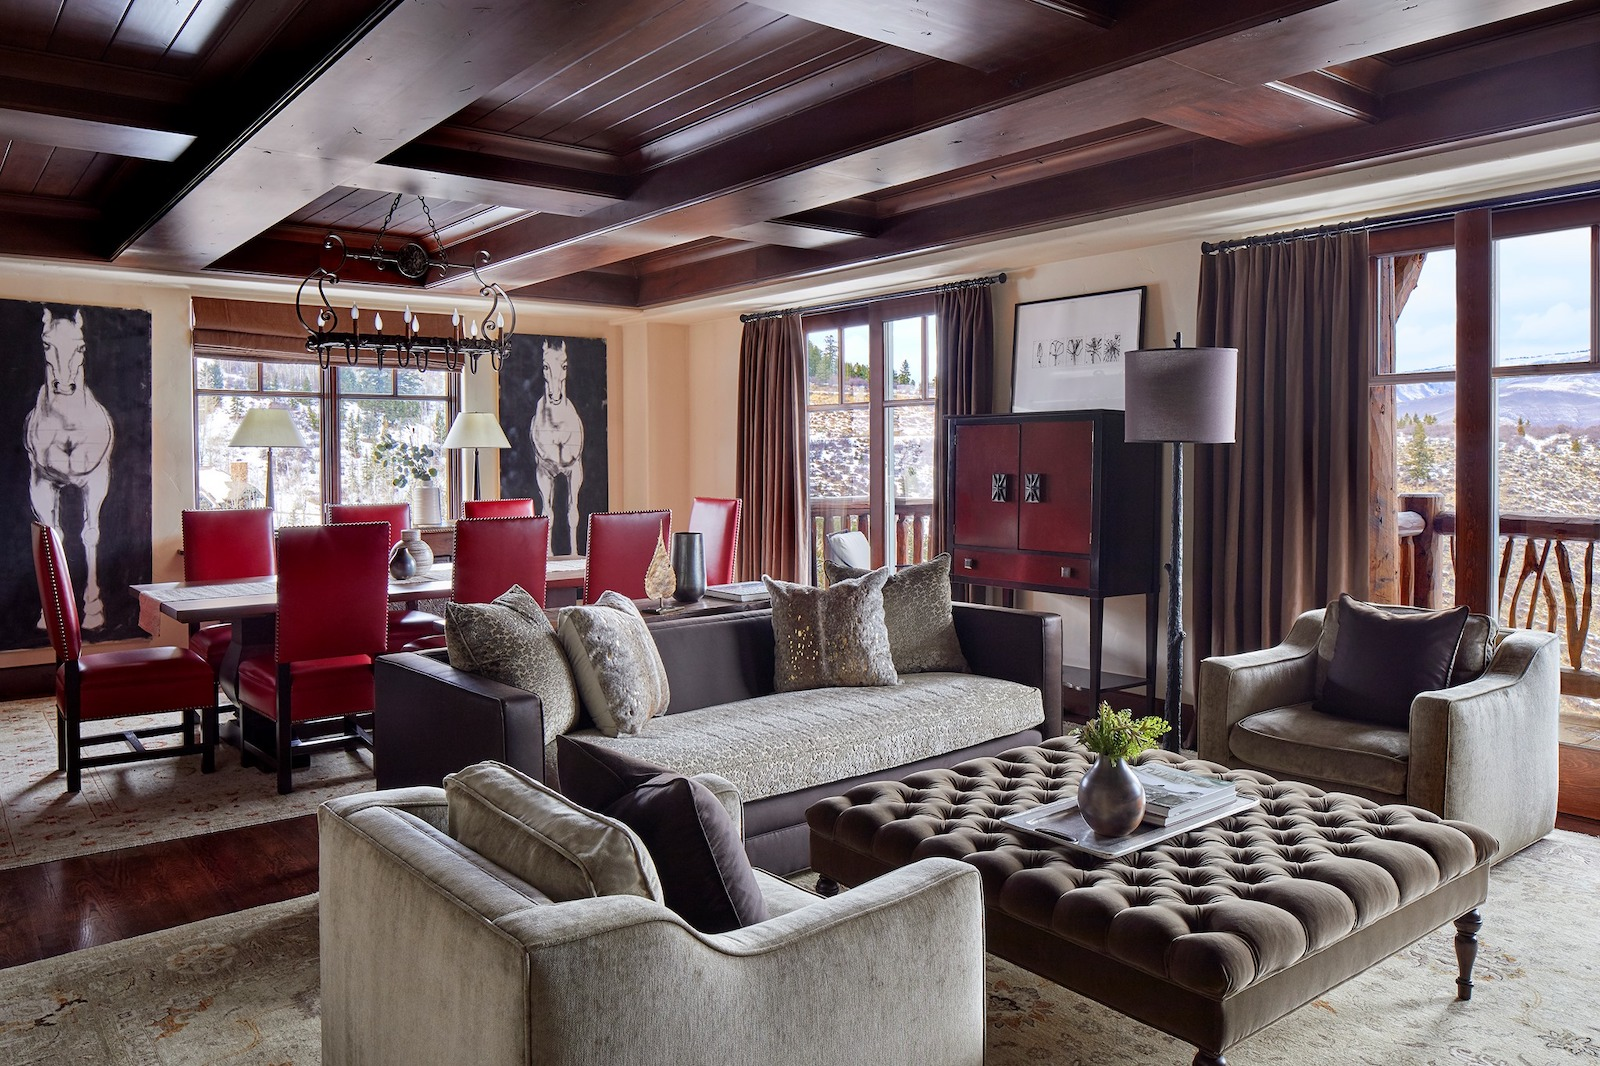 Image of a penthouse at The Ritz Carlton, Bachelor Gulch in Avon, Colorado